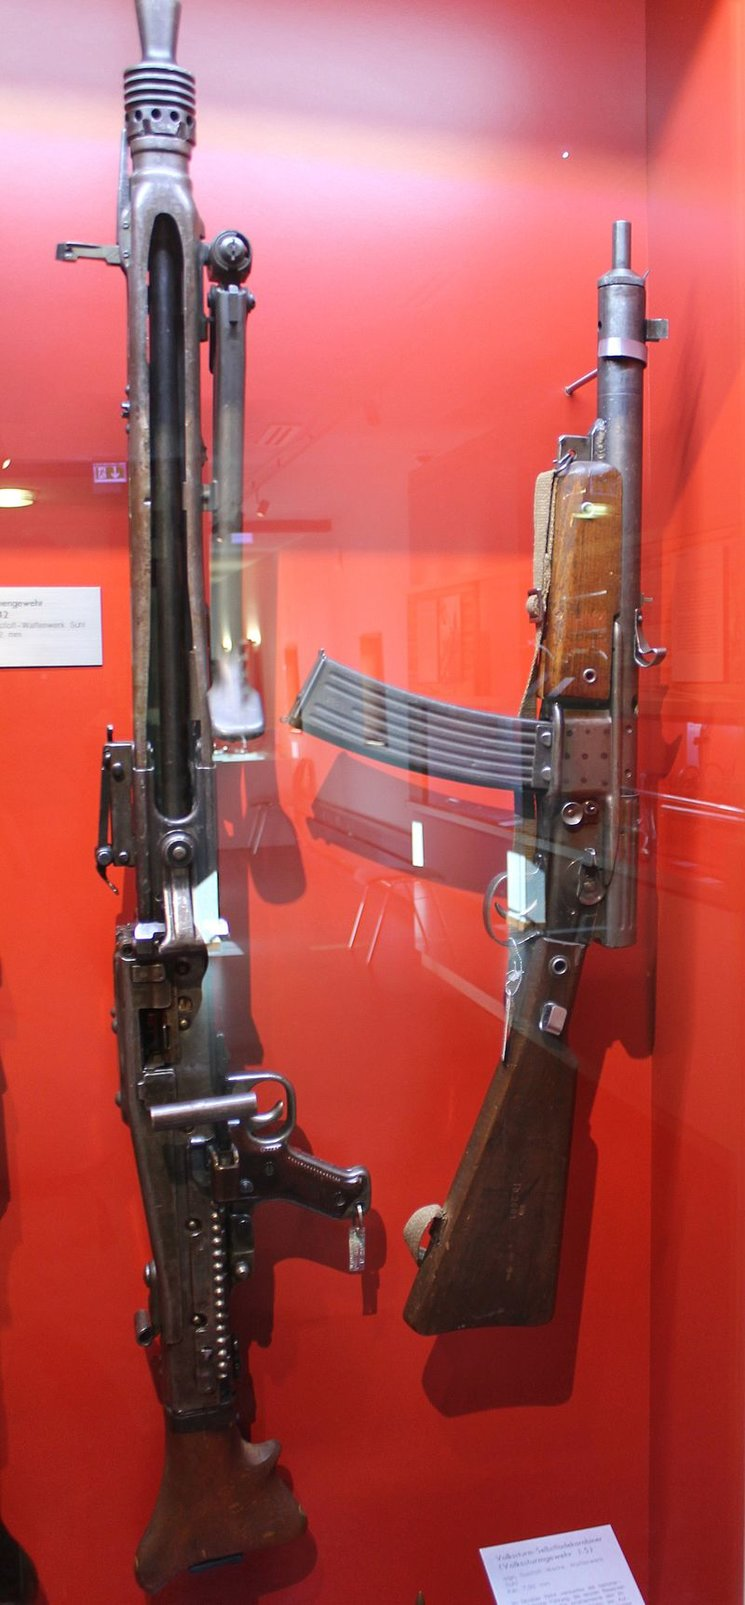 Un magnífico ejemplar de Volkssturmgewehr junto a una MG-42